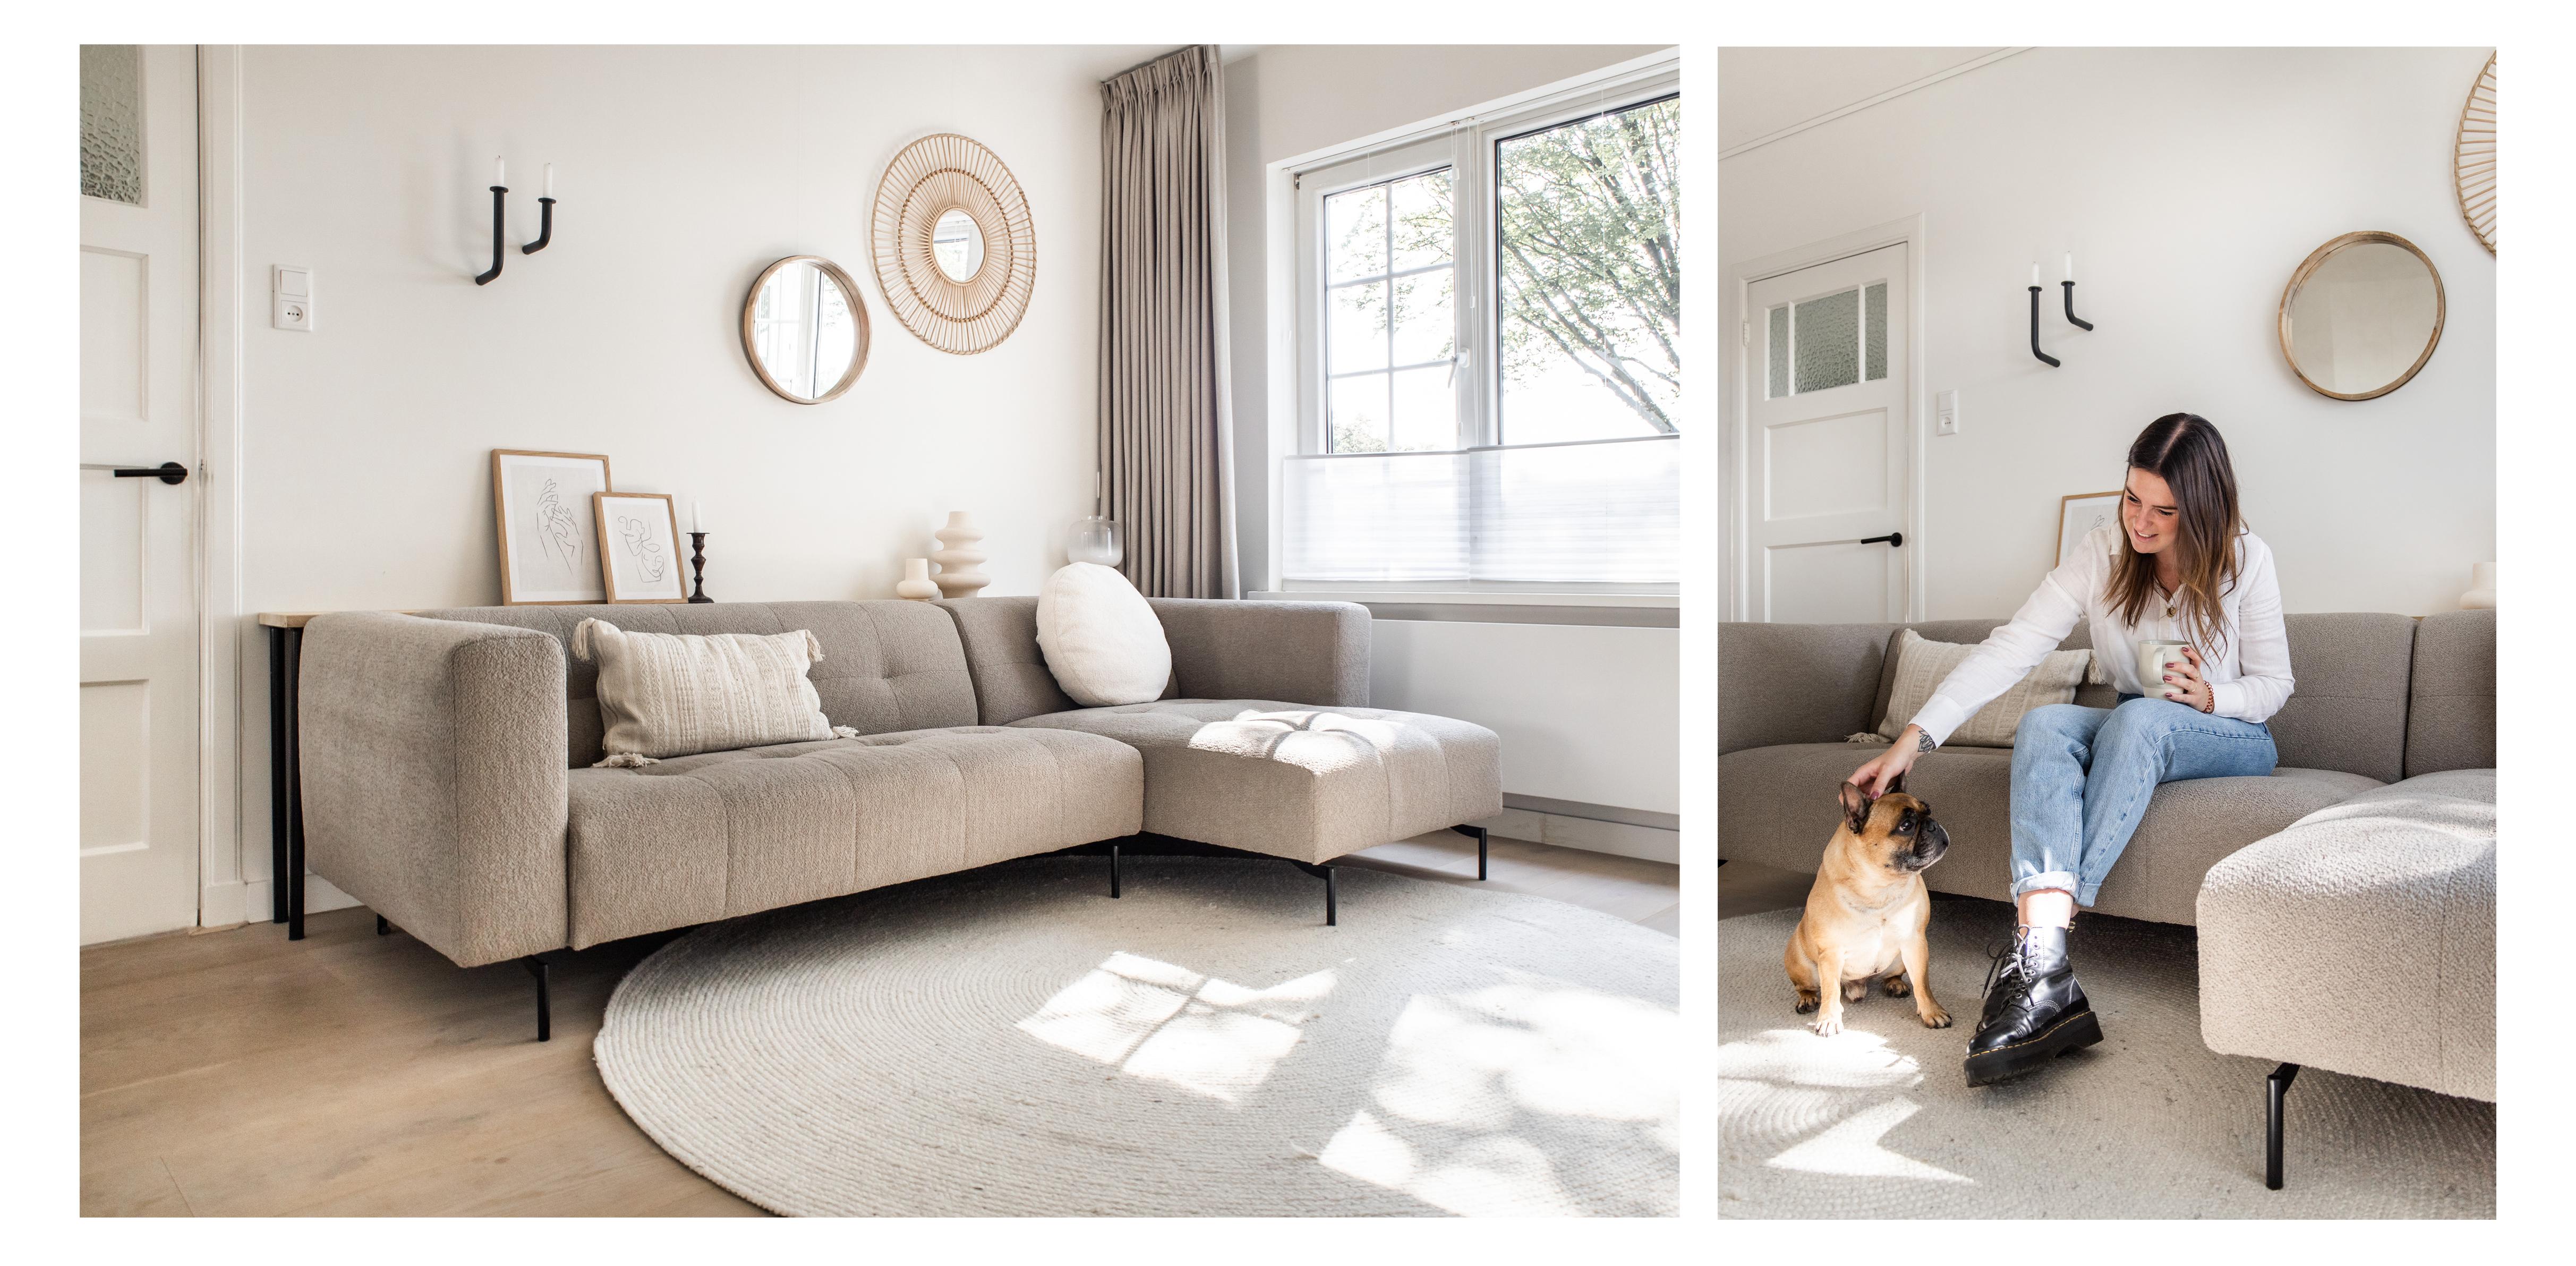 woonkamer, bank, bouclé, zachte stof, zitbank, interieur, styling, hoekbank, bruine bank